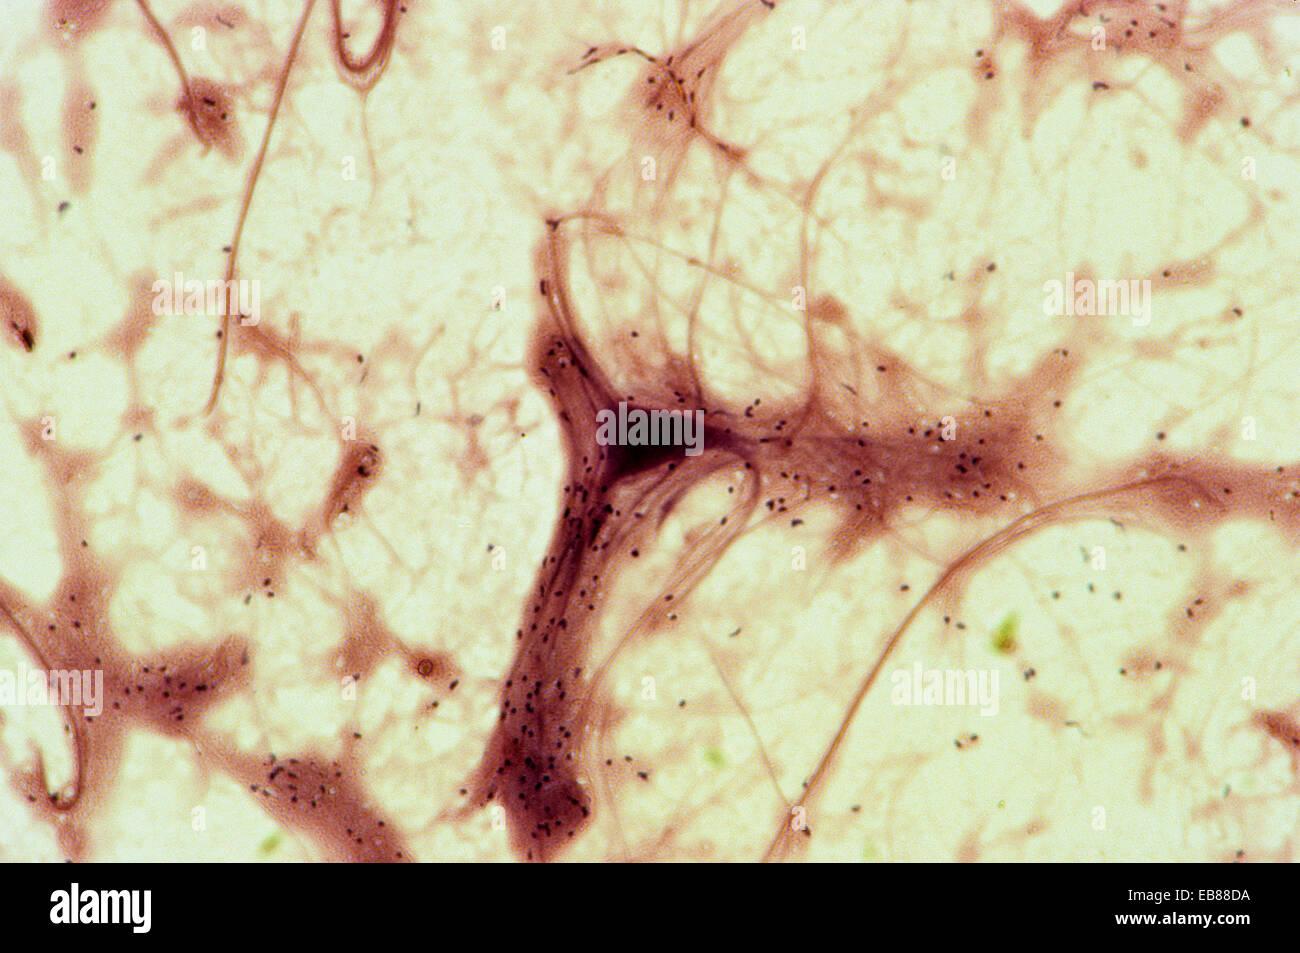 Neuron, nerve cells, 400 X - Stock Image